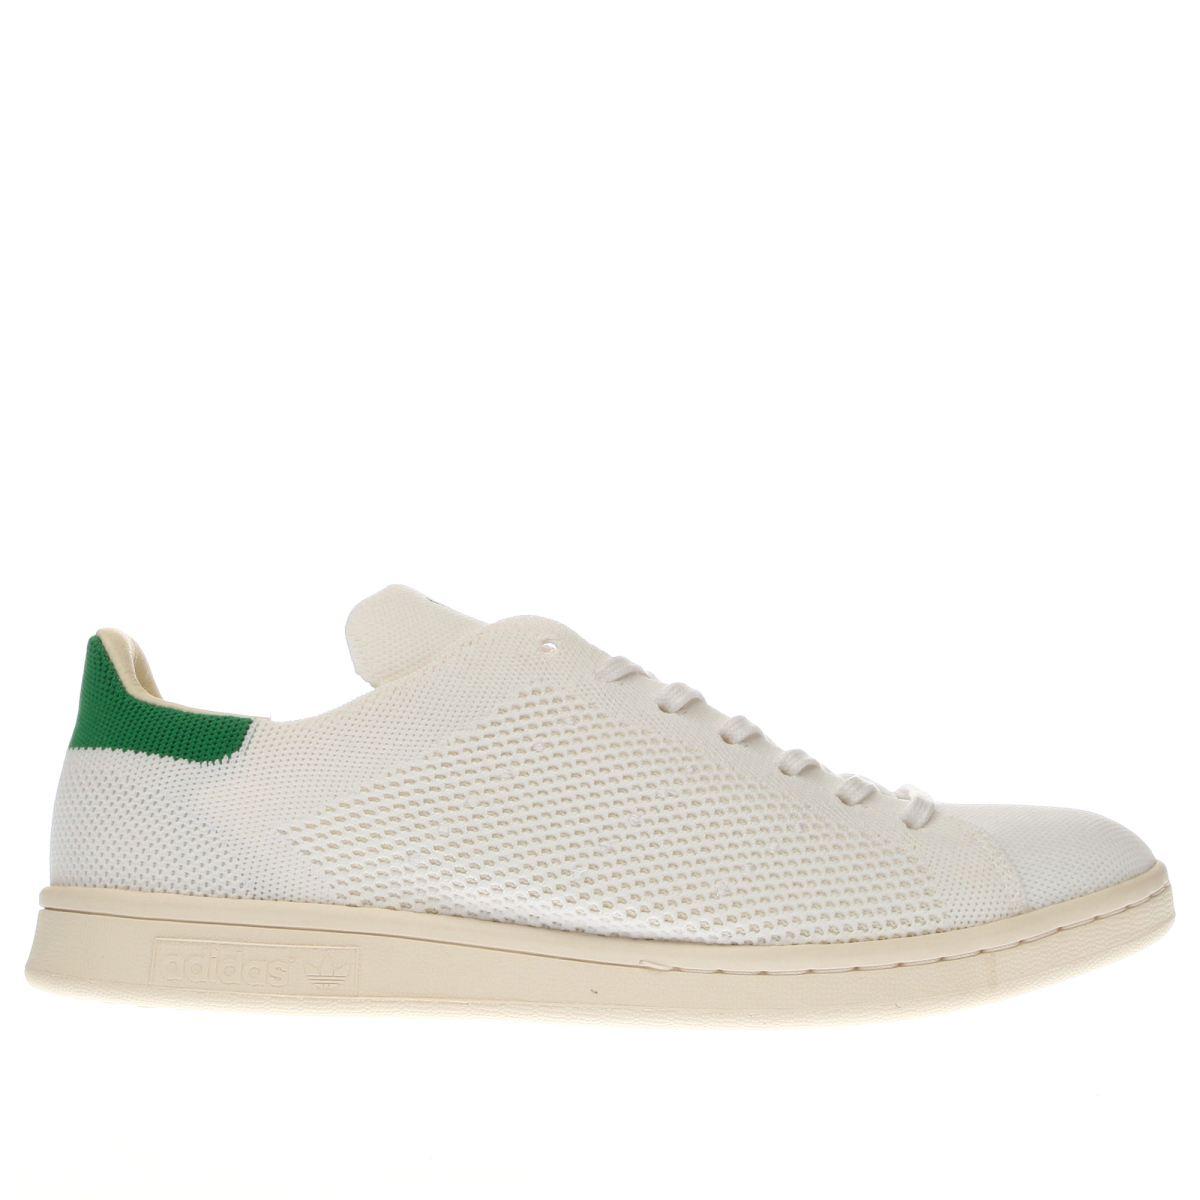 adidas white & green stan smith primeknit trainers